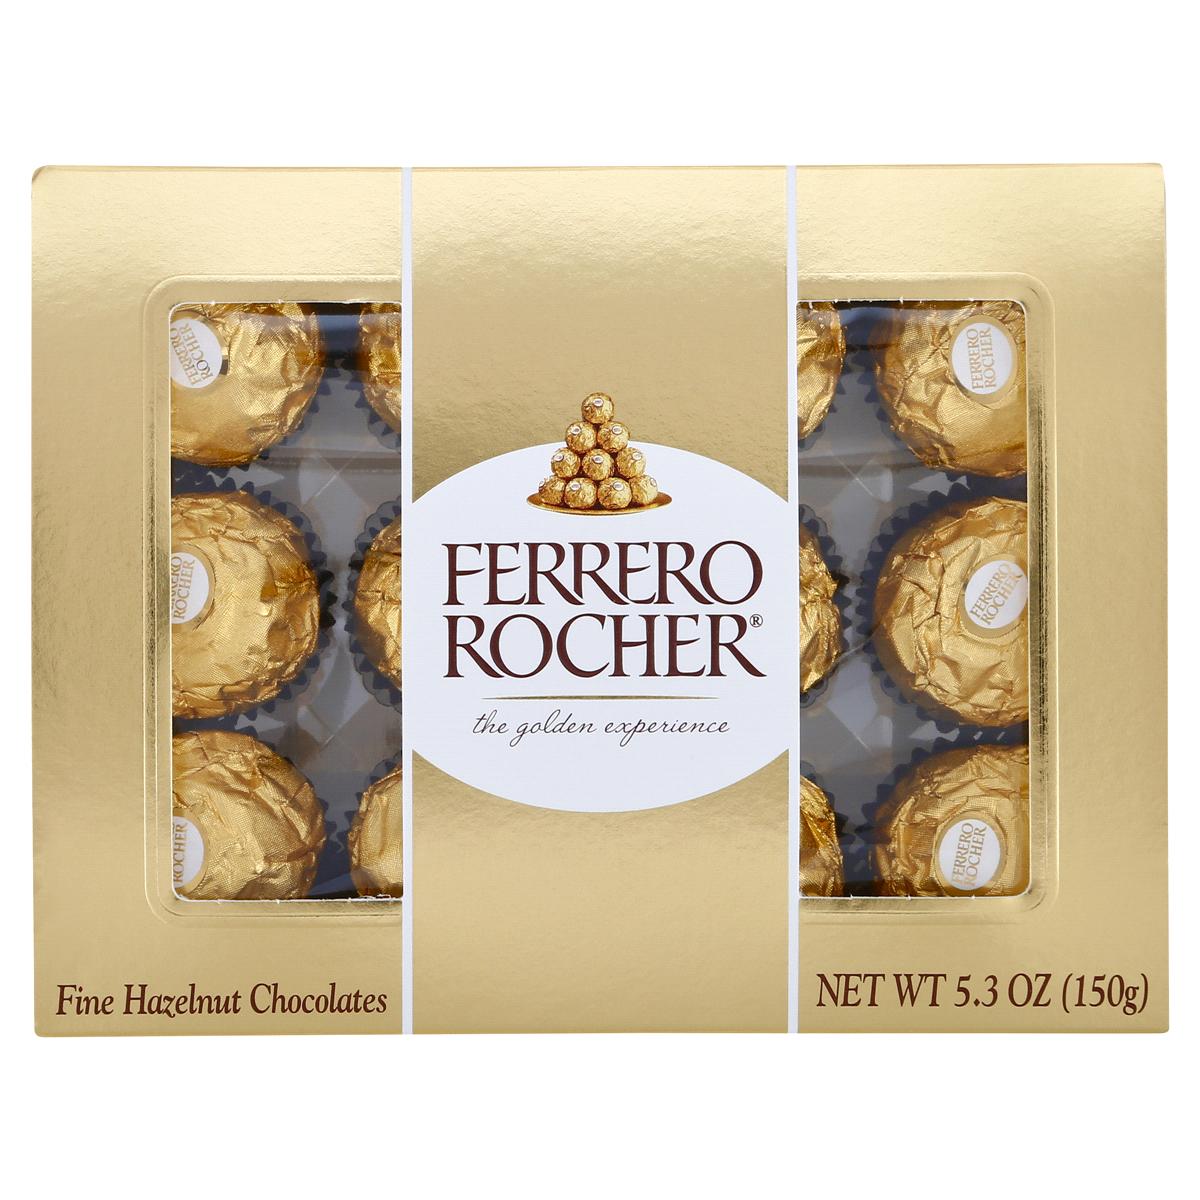 Candy / Chocolate / Ferrero Rocher, 12 piece box 5.3 oz